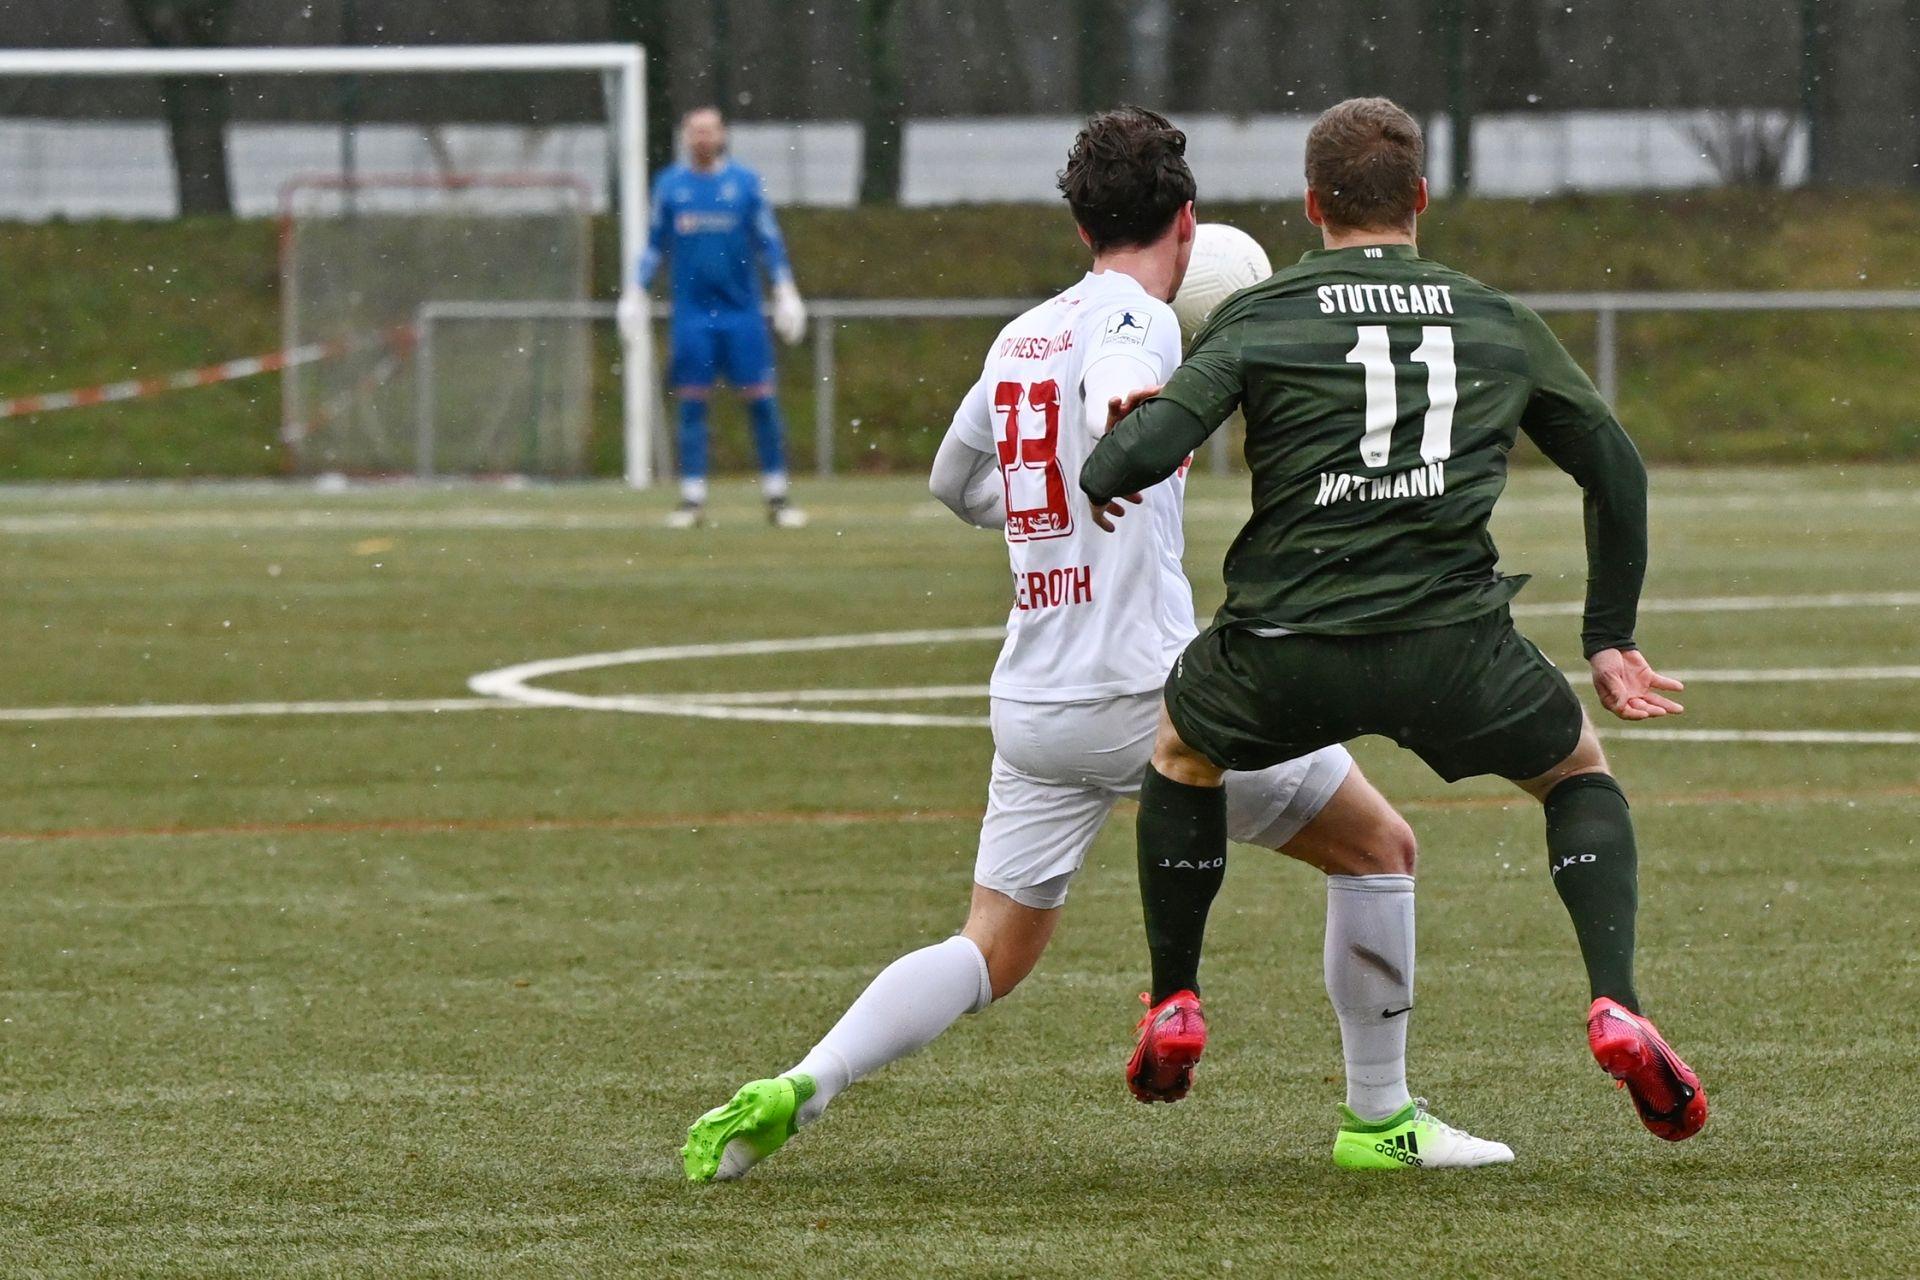 Regionalliga Südwest 2020/21, KSV Hessen Kassel, VfB Stuttgart II, Endstand 0:4, Luis Allmeroth